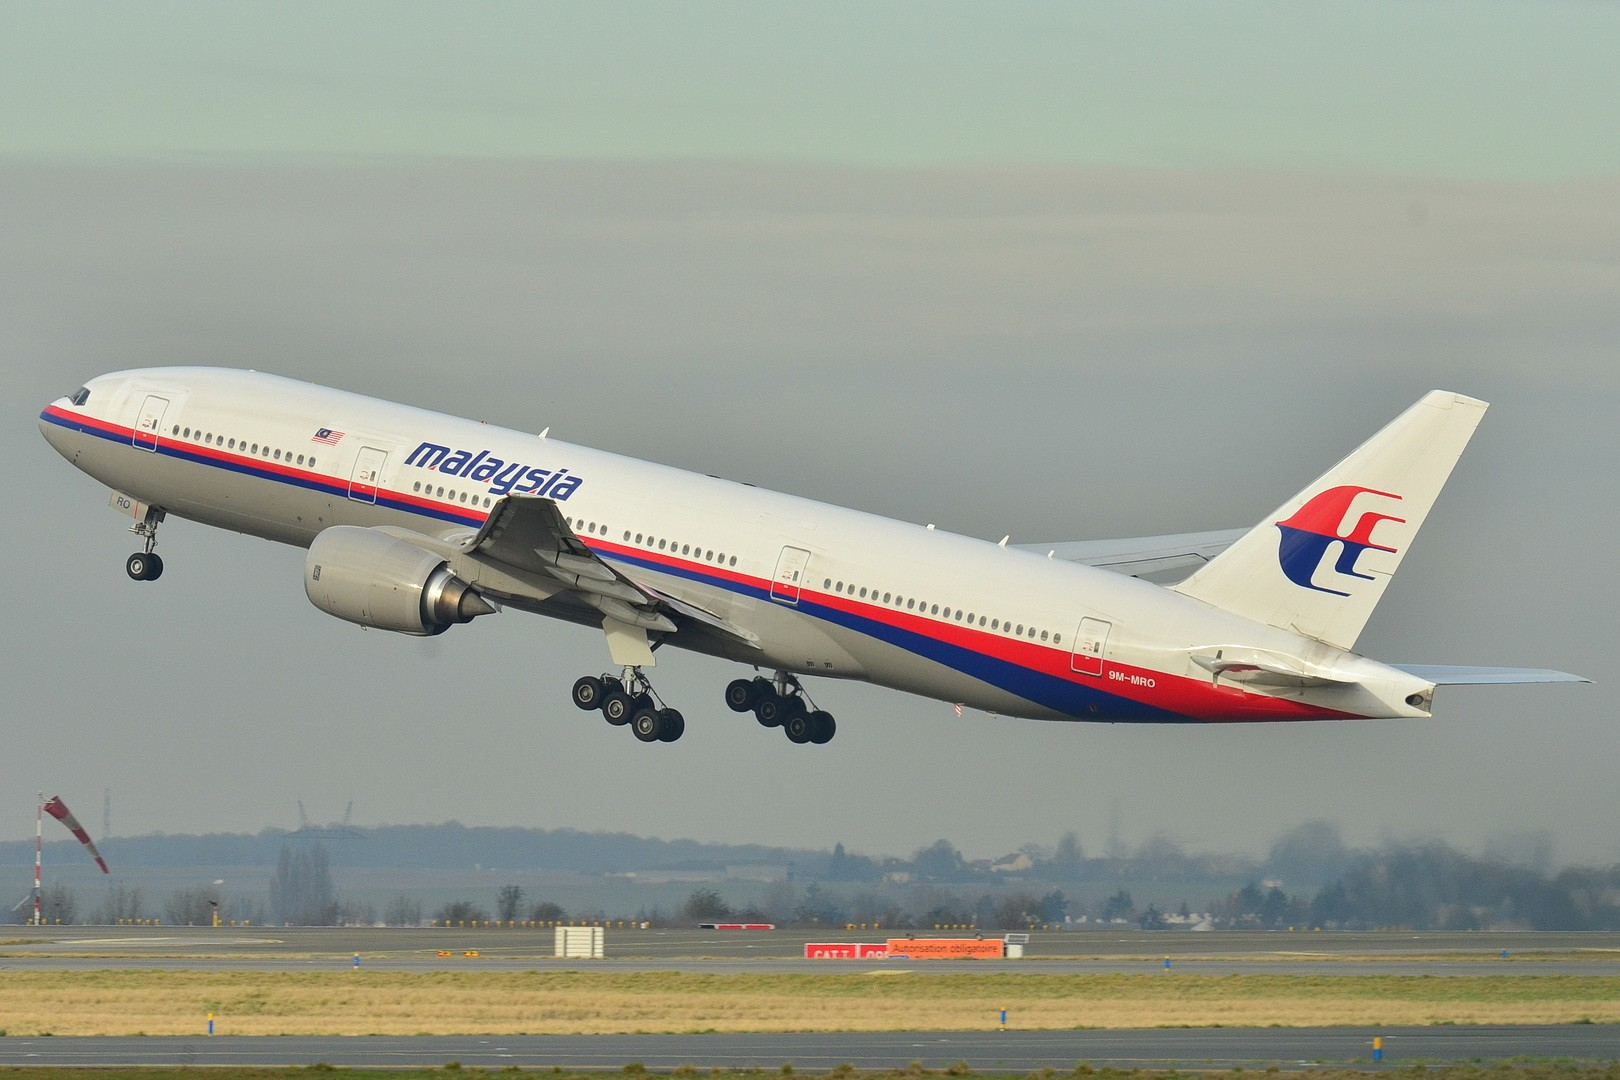 Boeing 777-200ER (Foto: Wikimedia Commons)